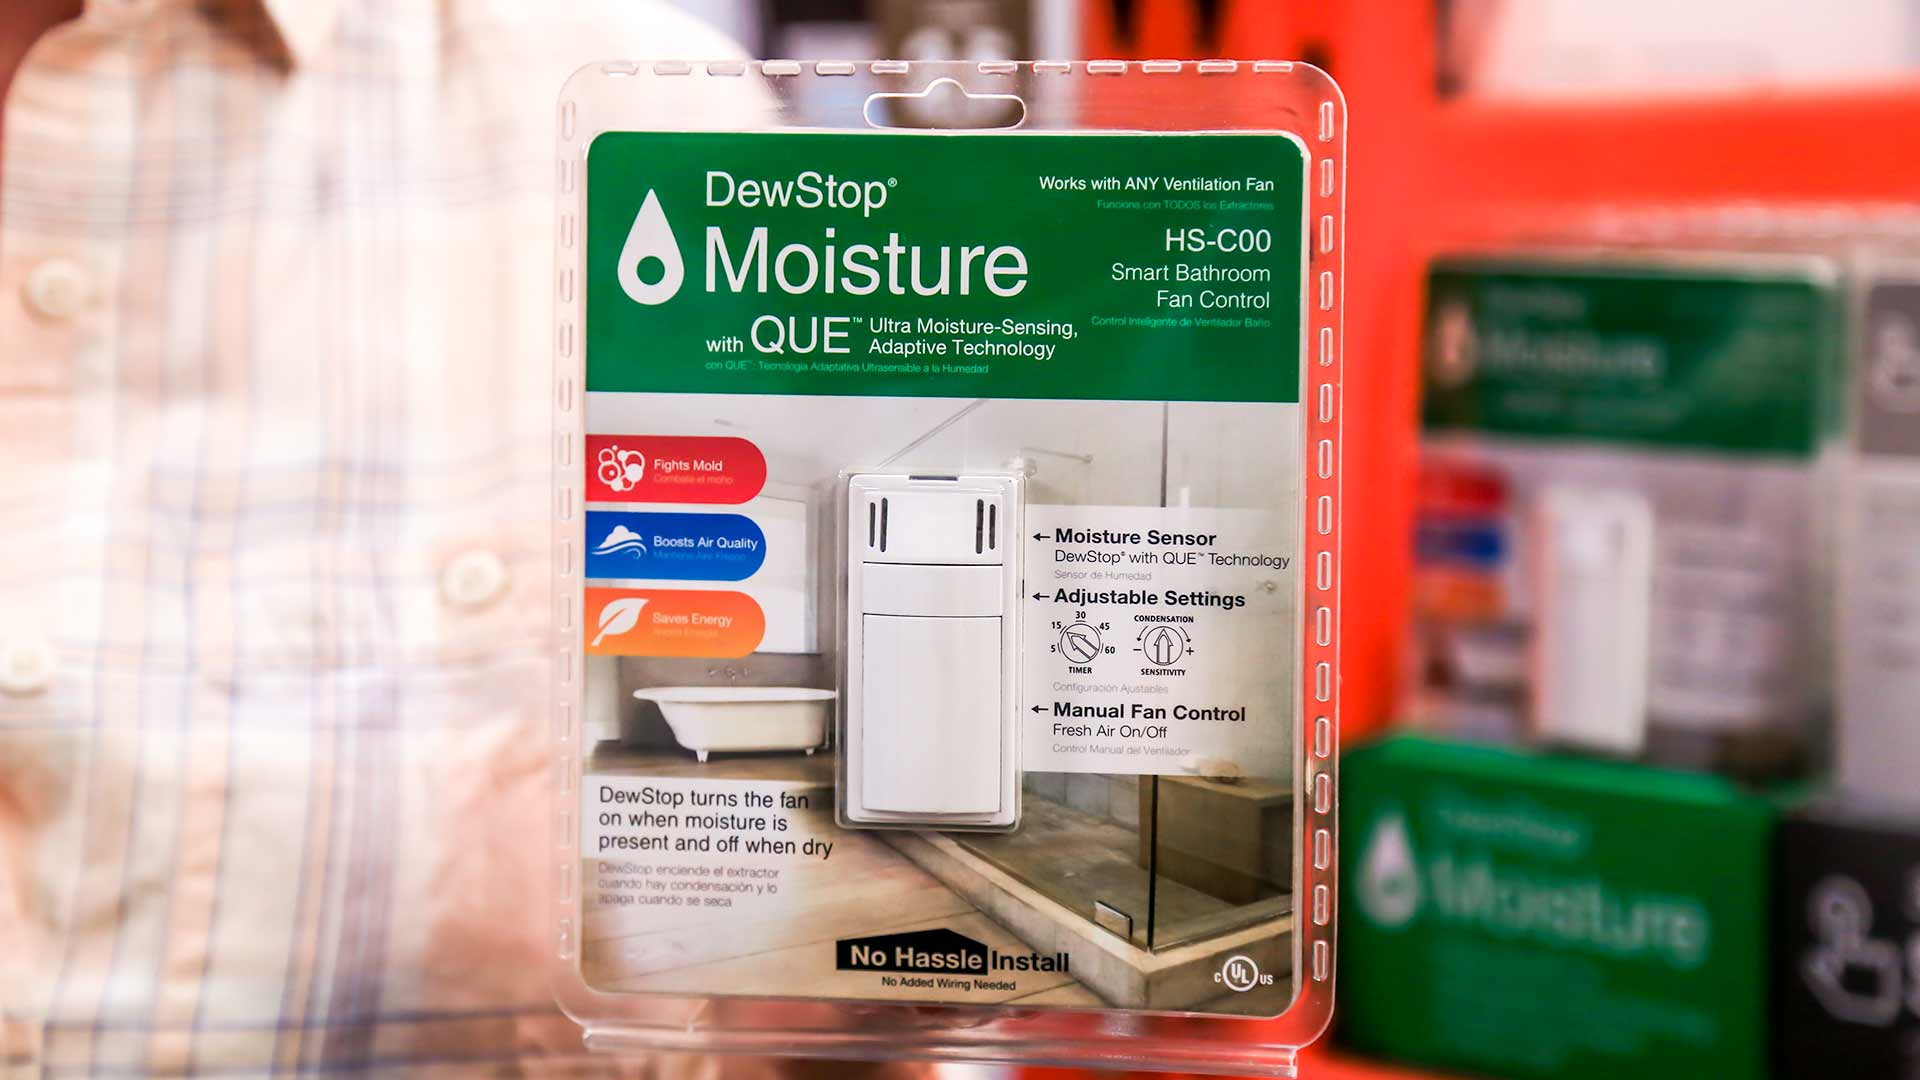 retrofit any bathroom vent fan to be humidity sensing